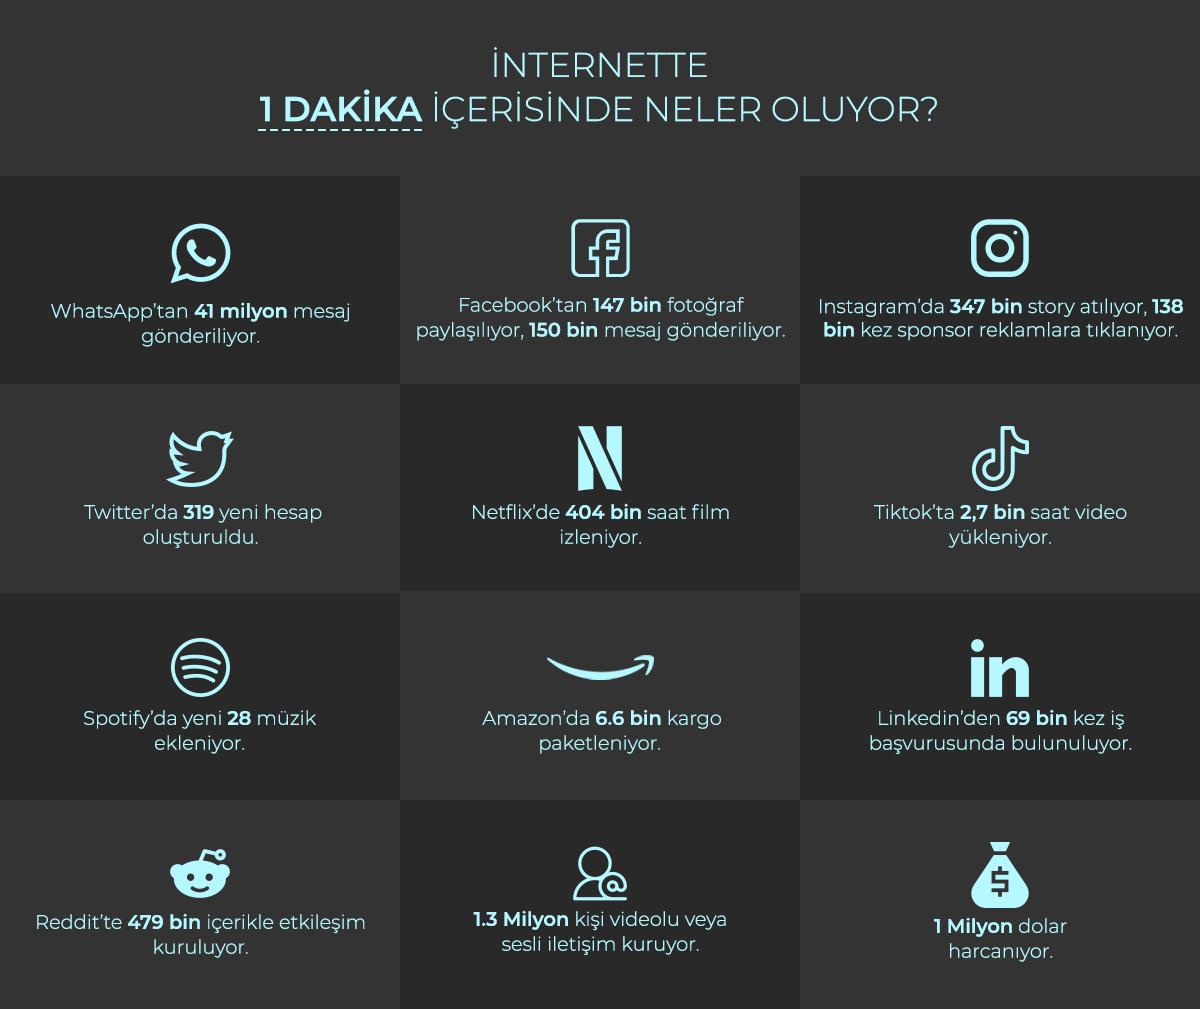 İnternette 1 Dakika